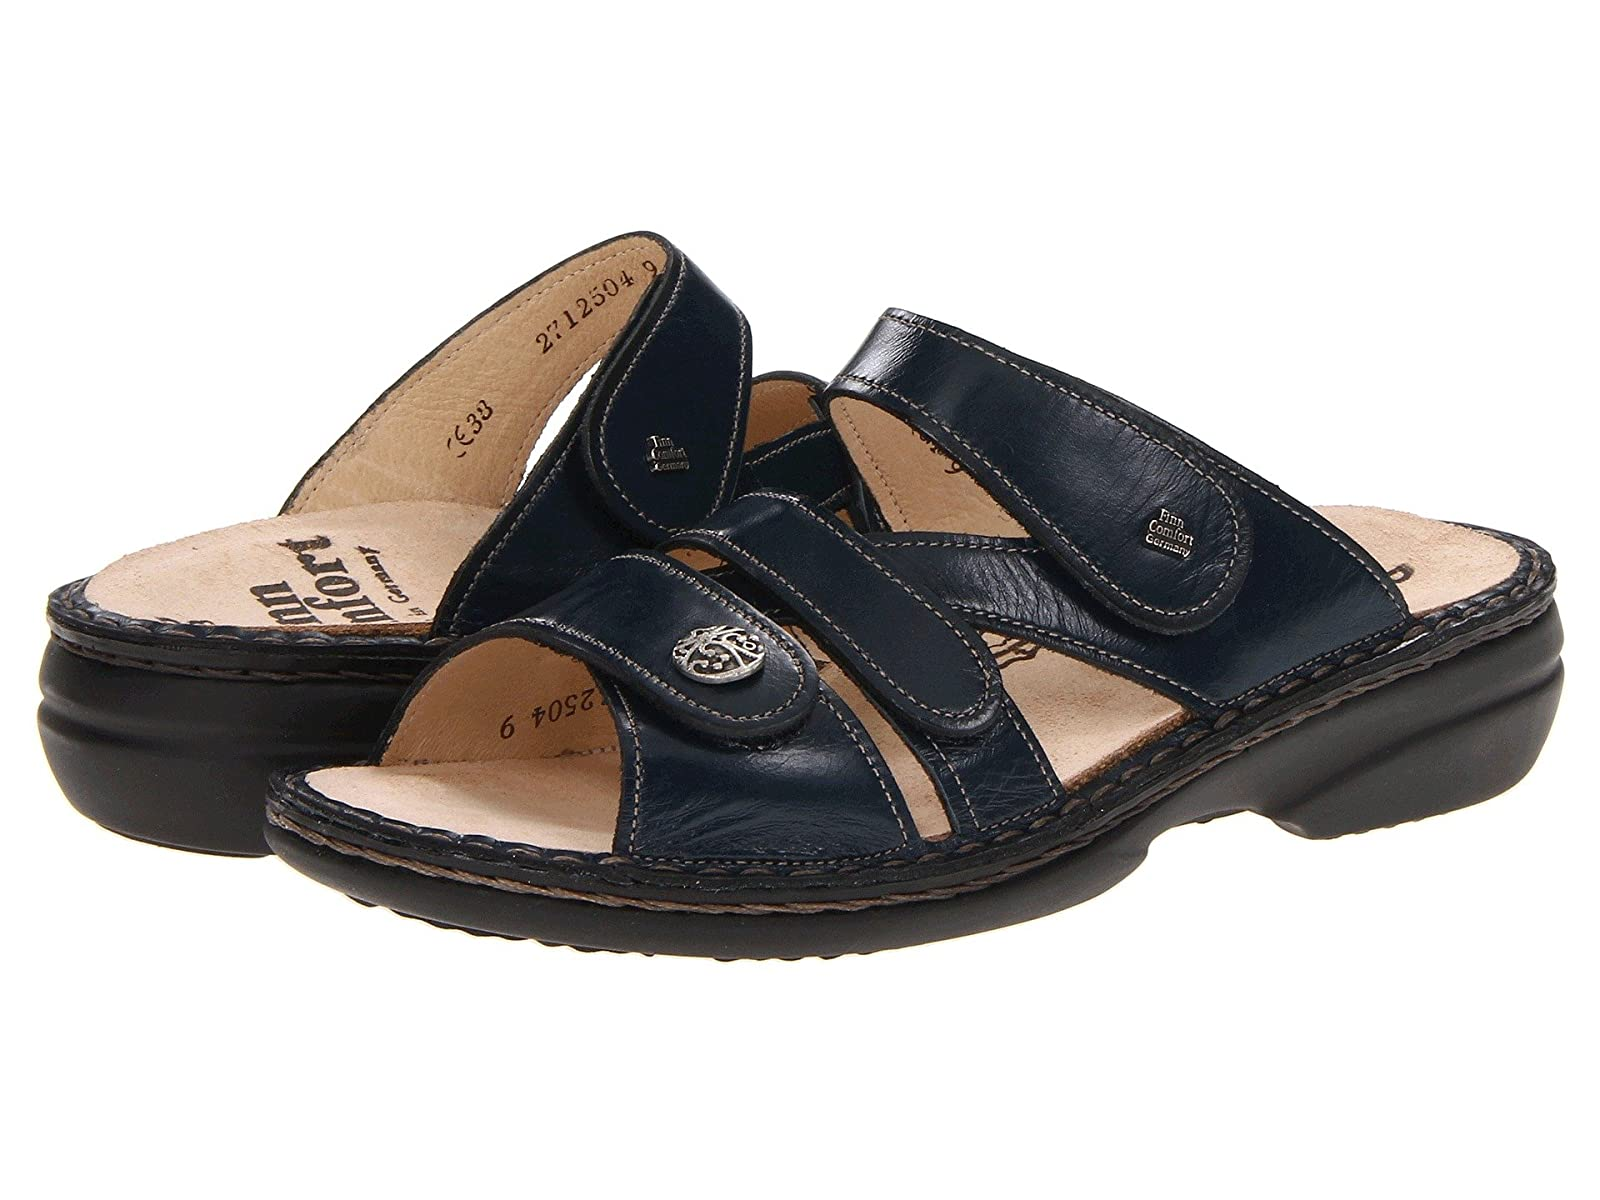 Finn Comfort Soft Ventura - 82568Atmospheric grades have affordable shoes